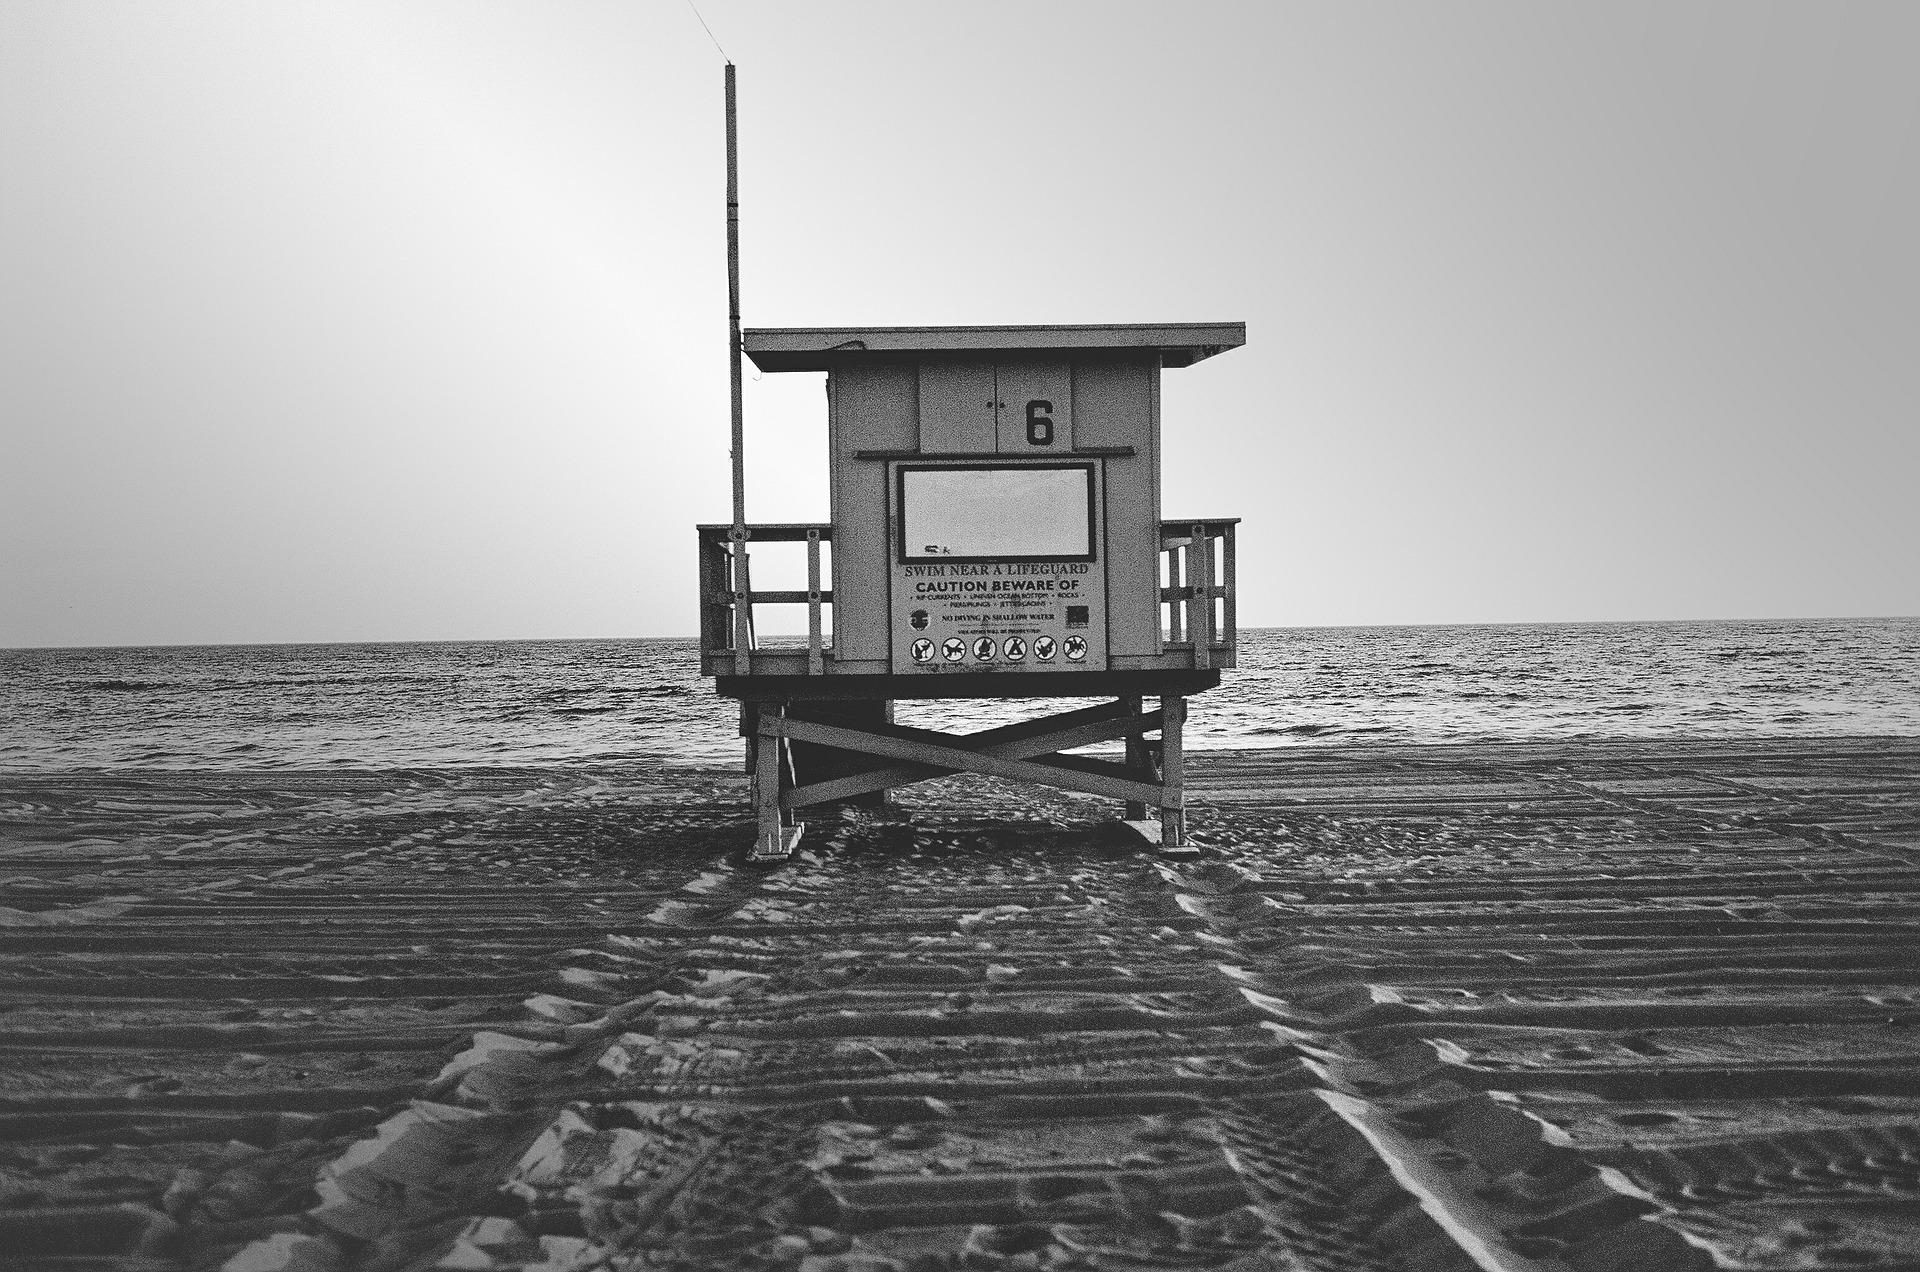 Redondo Beach Location